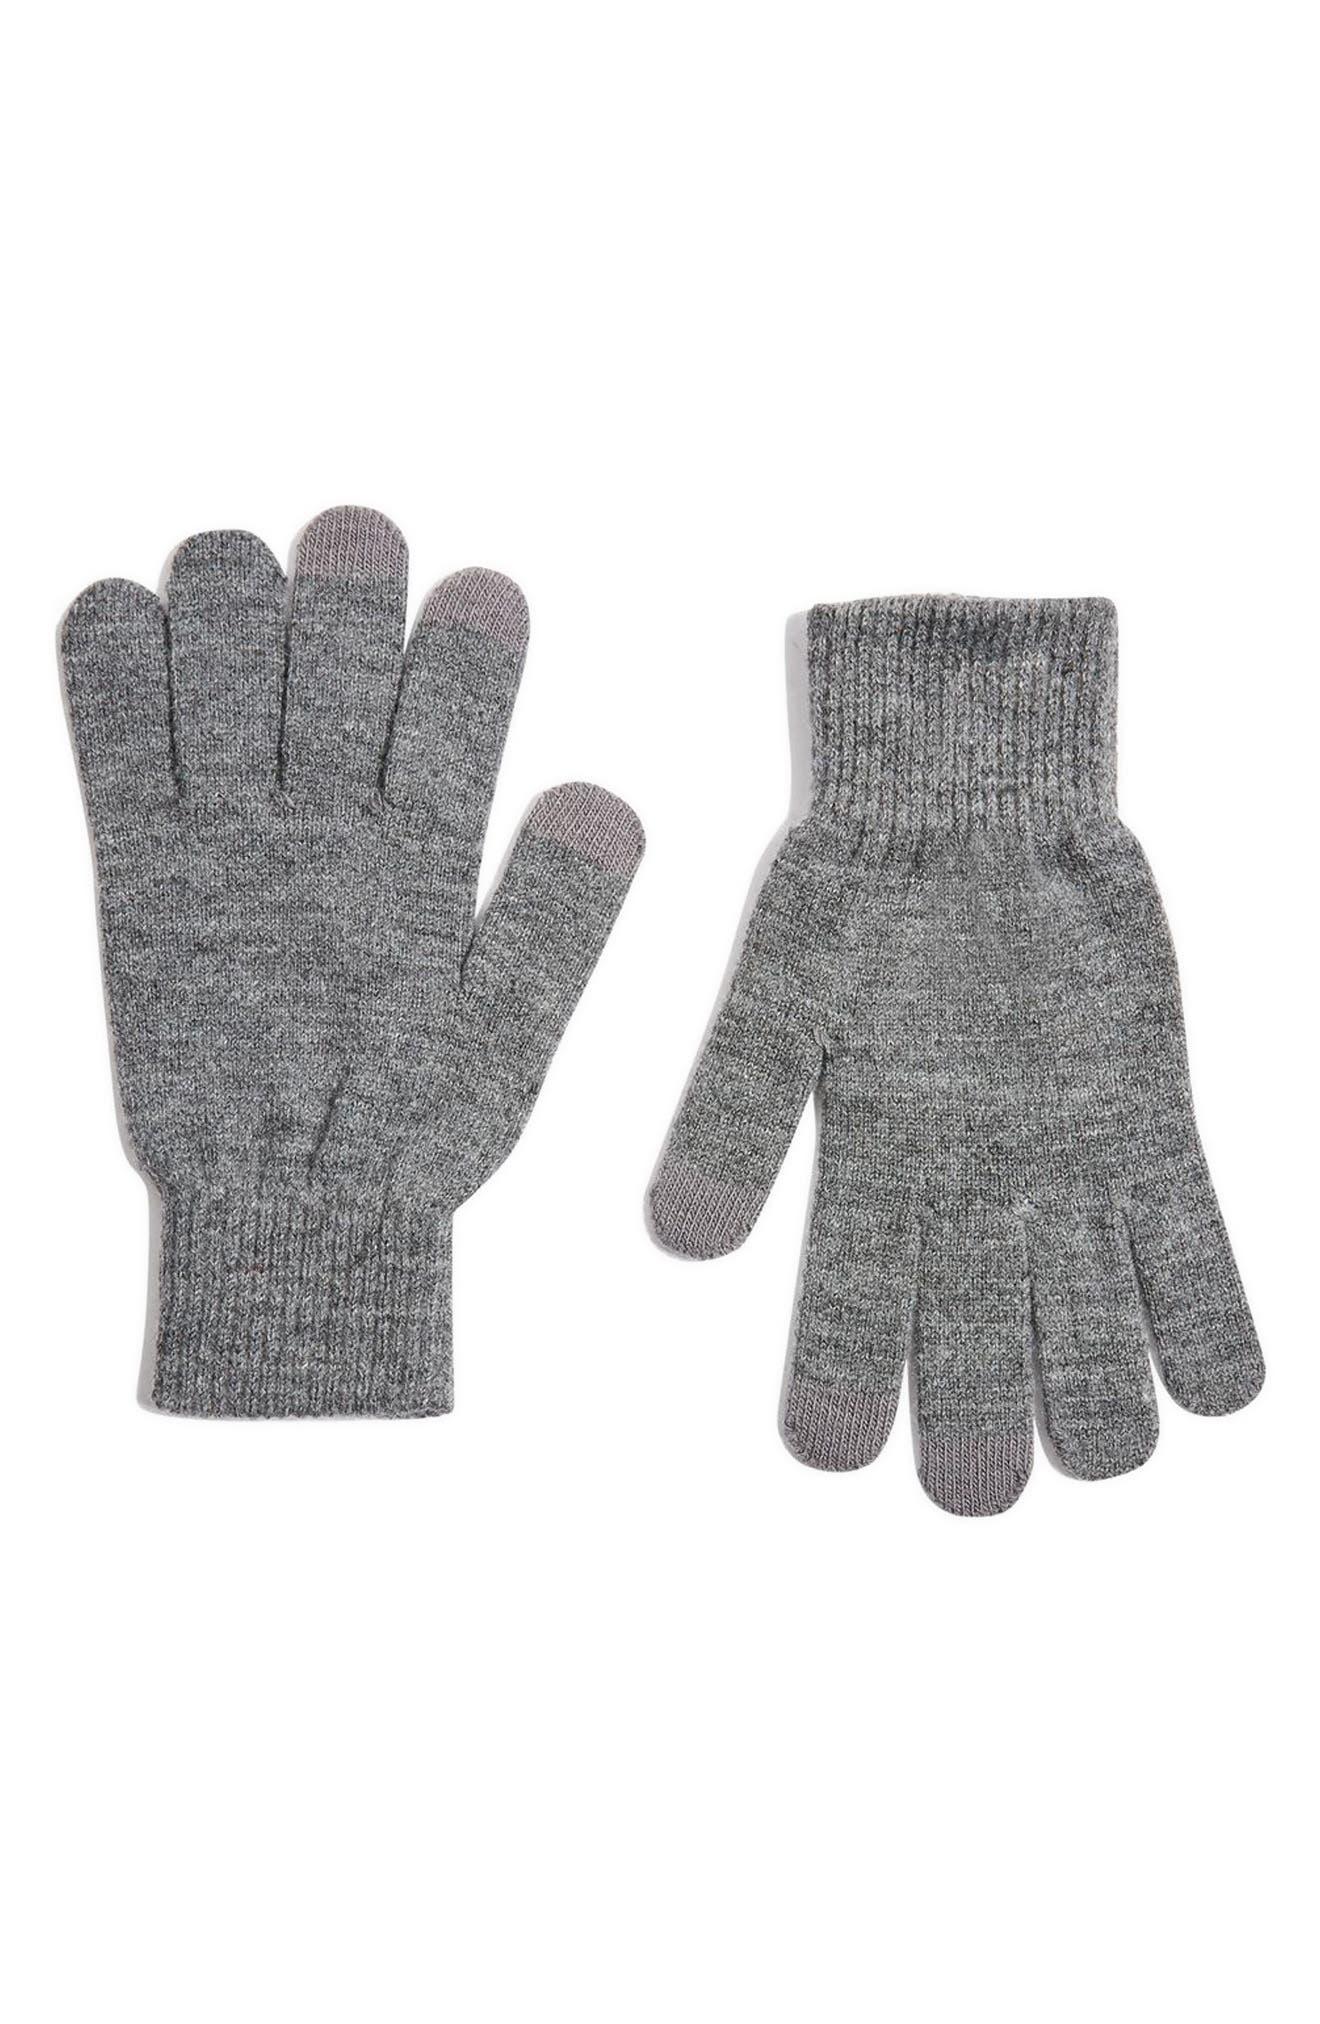 Topshop Core Winter Tech Gloves